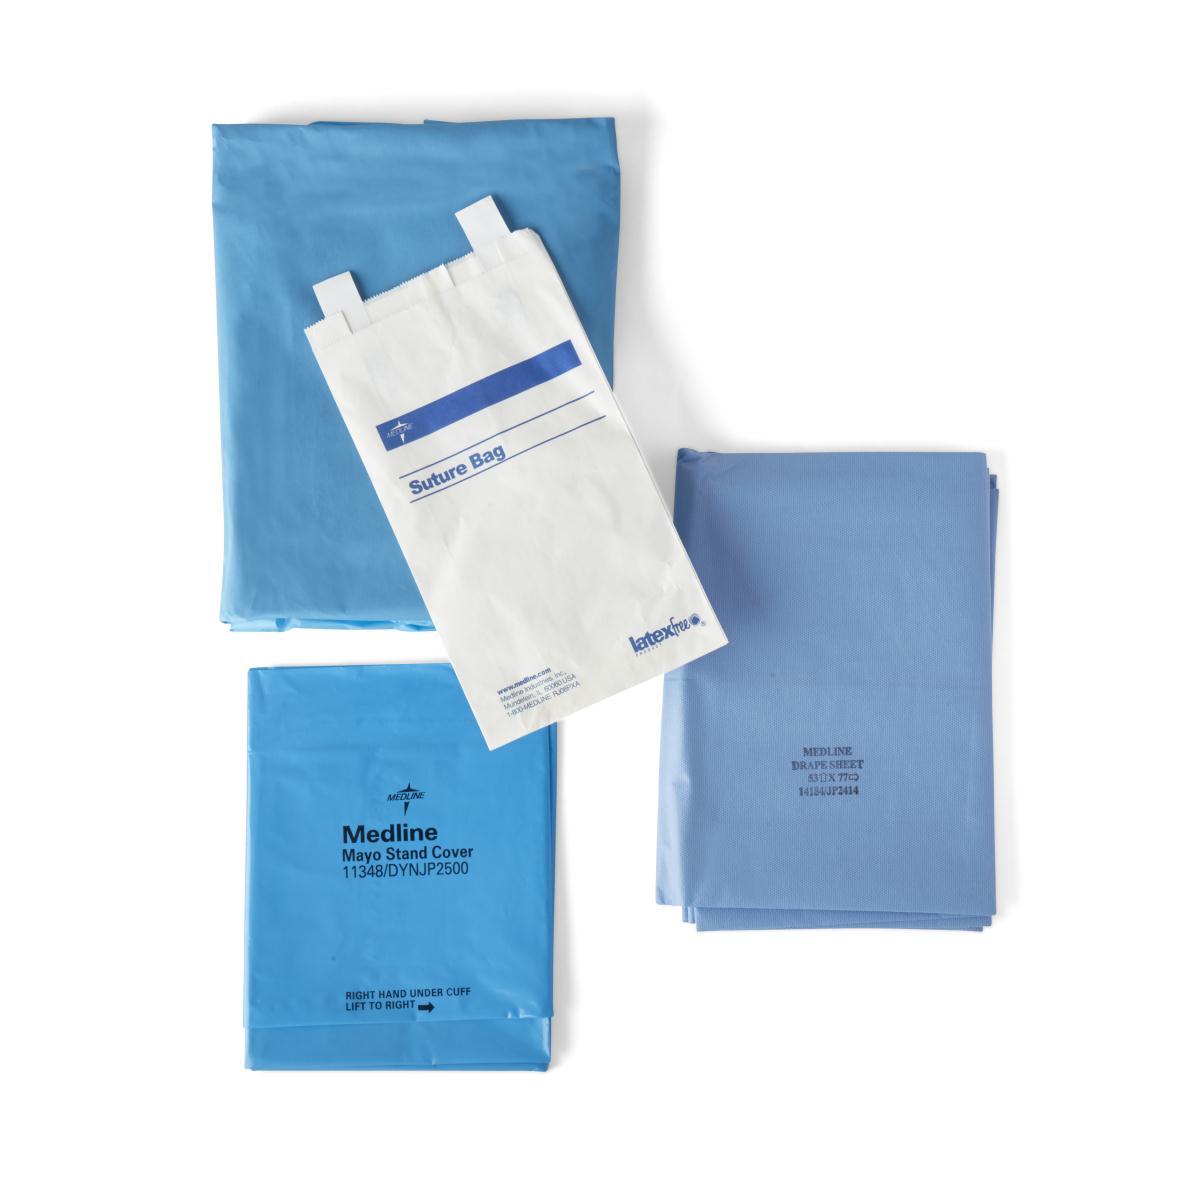 Medline Industries, DYNJP1010, Sterile Basic Surgical Pack III, Eclipse